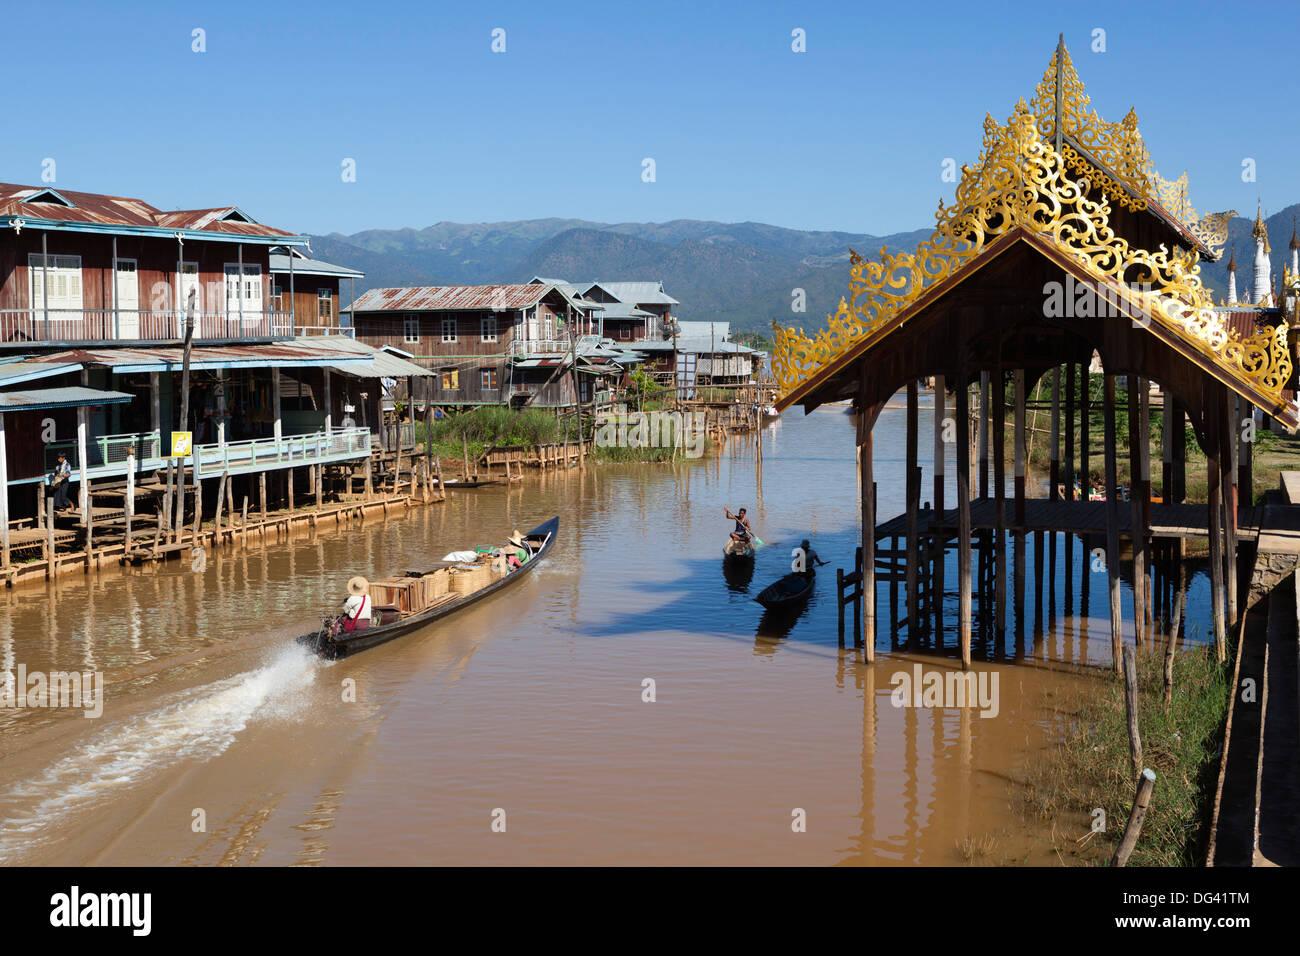 Canal-side village, Inle Lake, Shan State, Myanmar (Burma), Asia Stock Photo